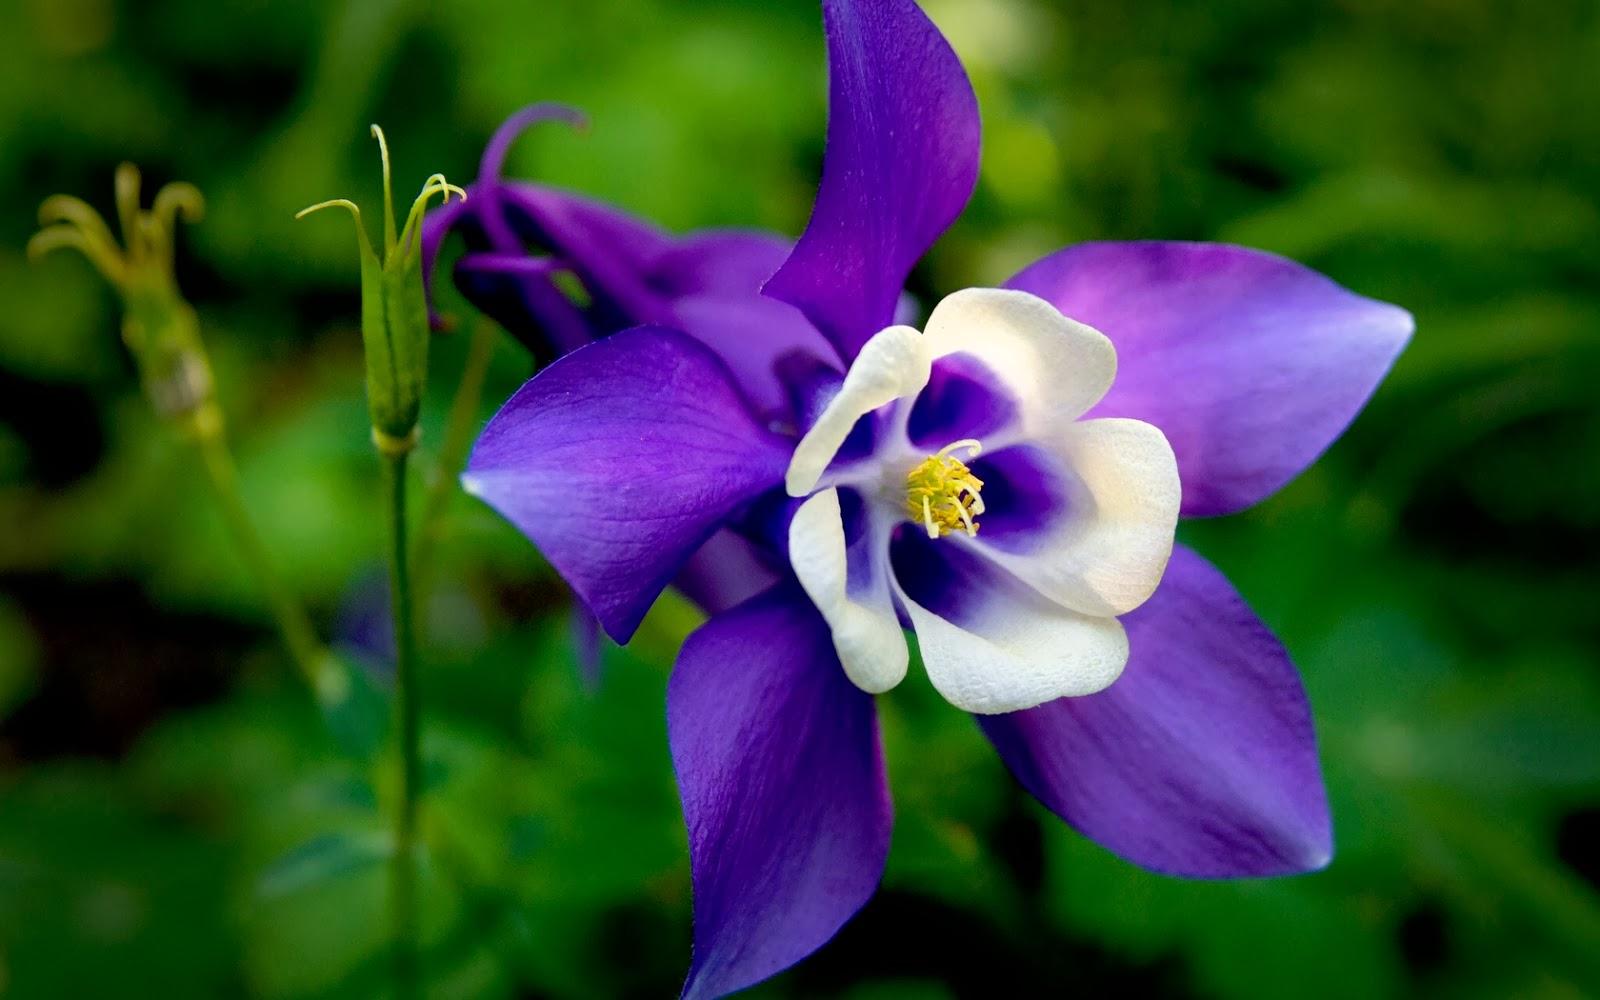 15 2015 fondos de pantalla flores escritorio flores paisajes mejores